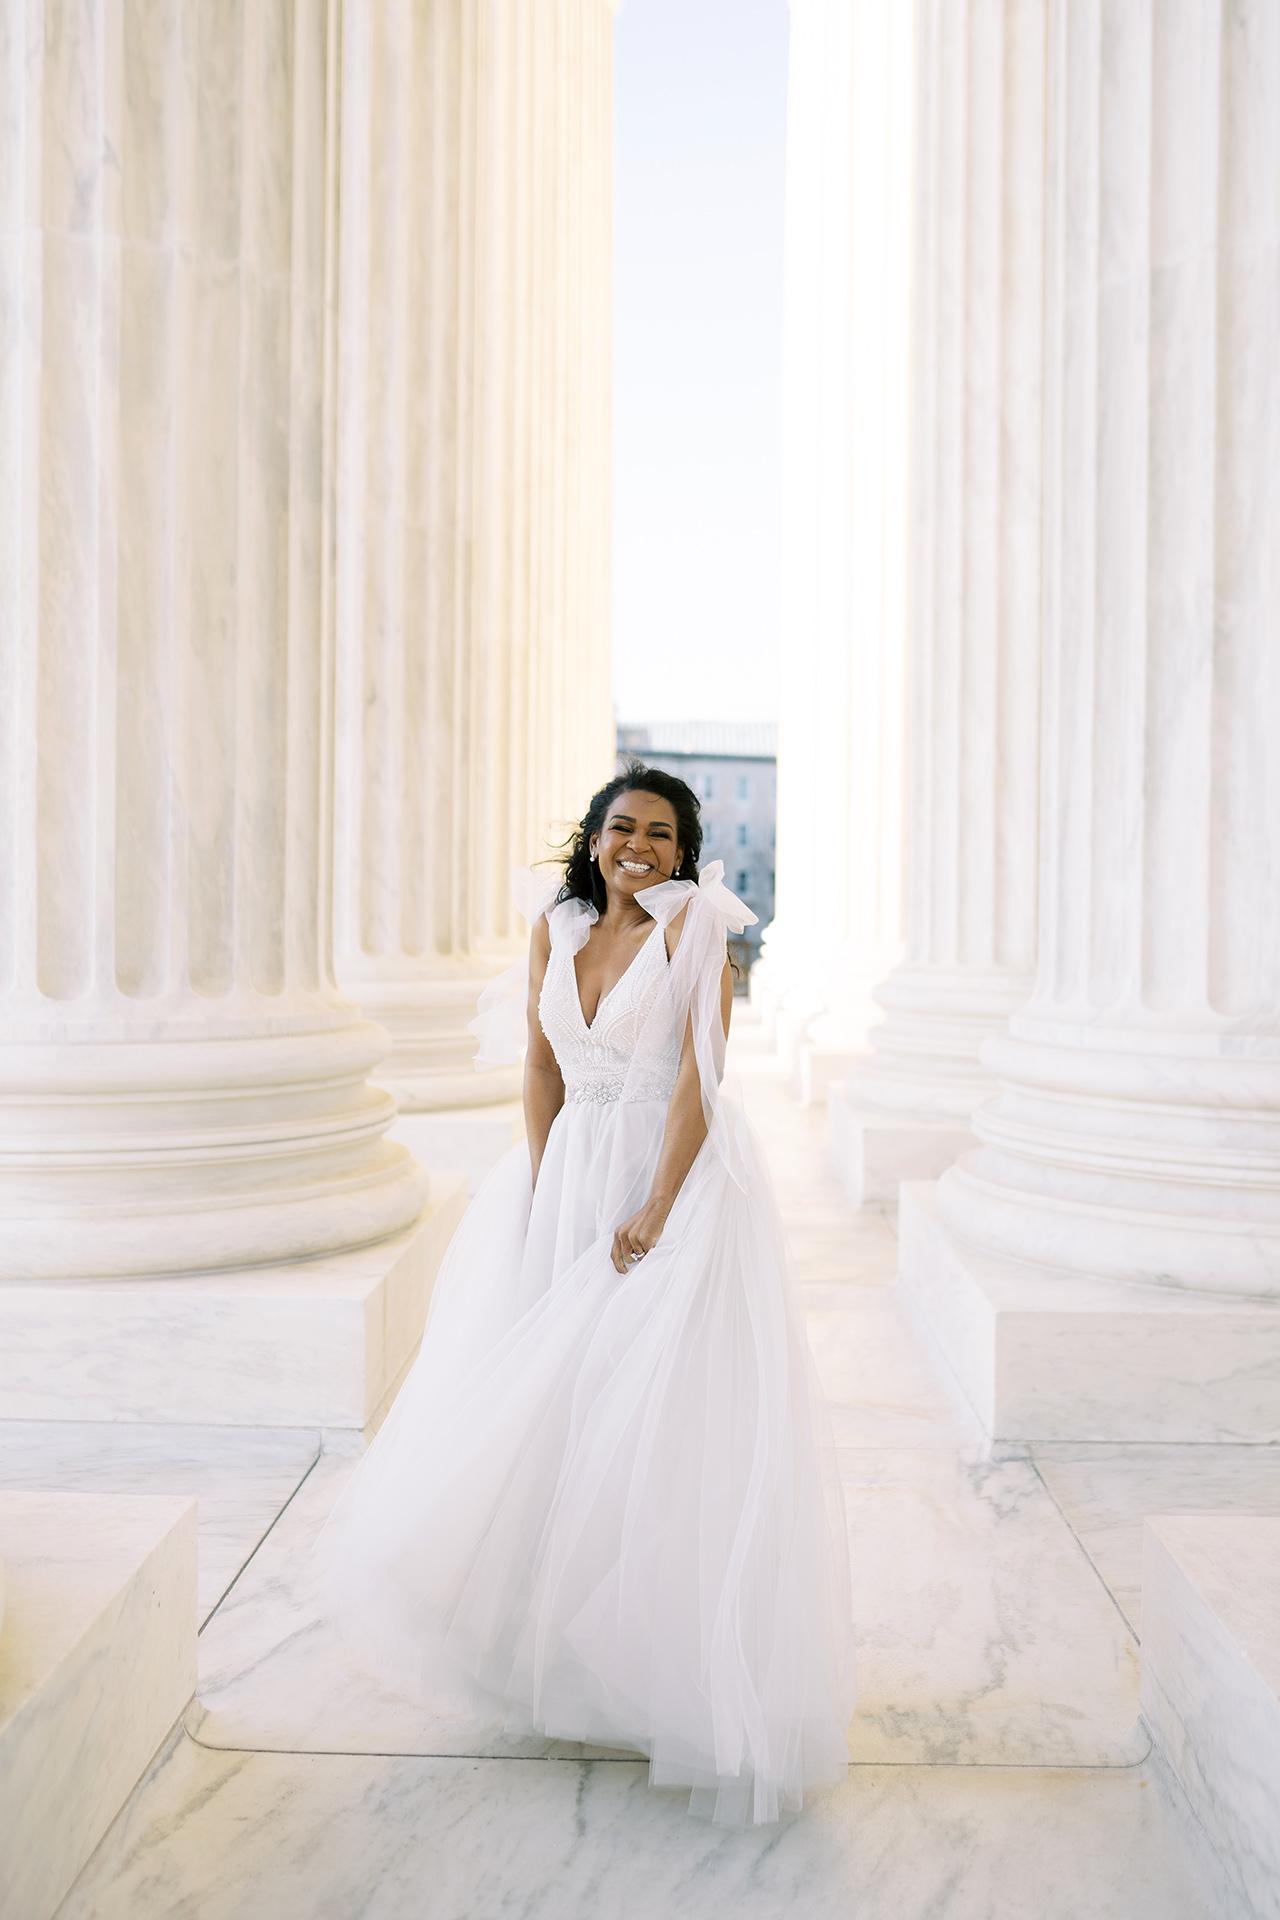 denita john wedding bride